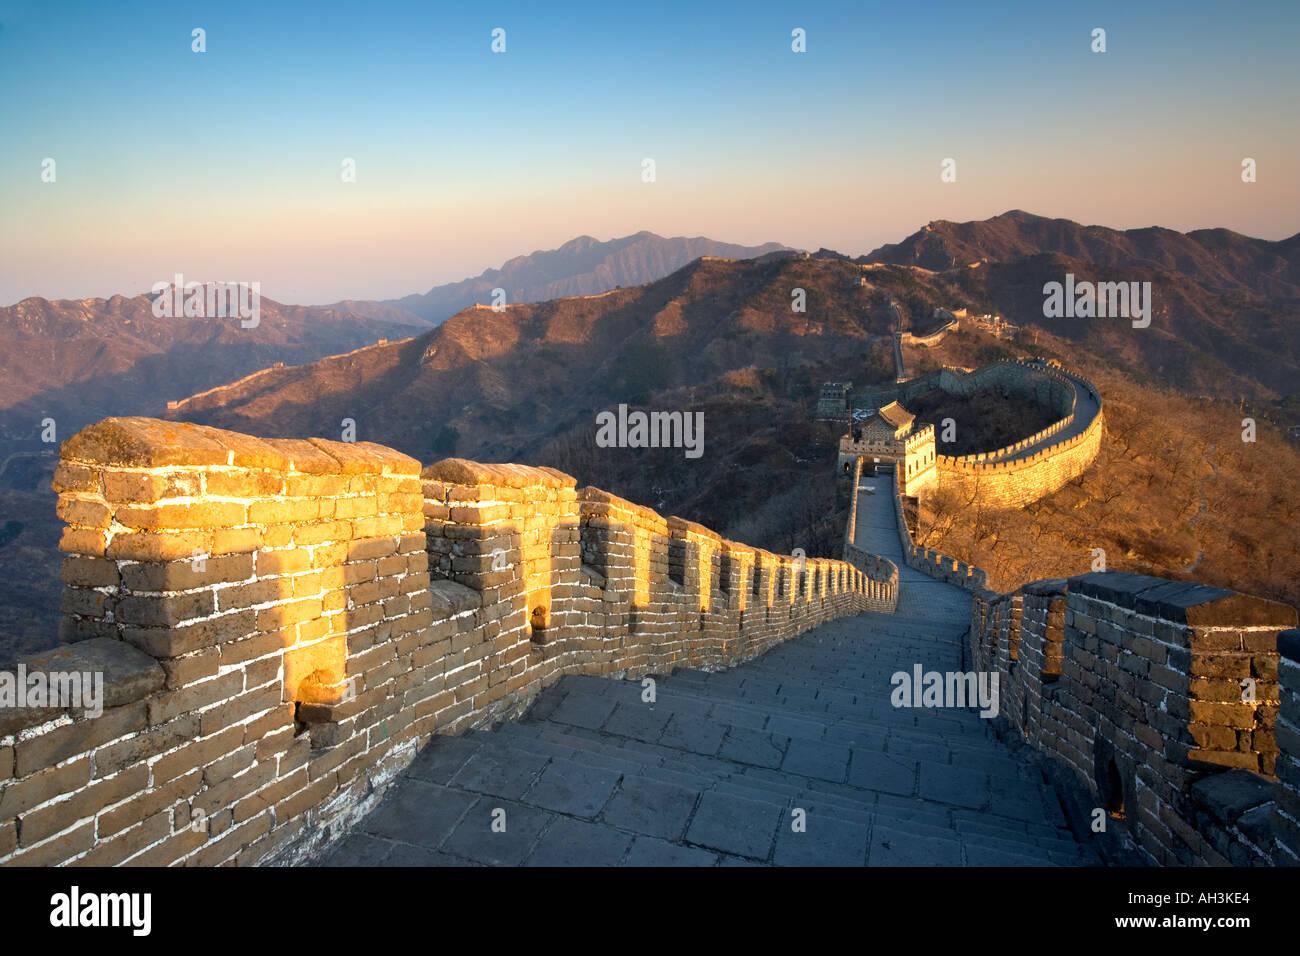 Die chinesische Mauer nahe Peking Stockbild